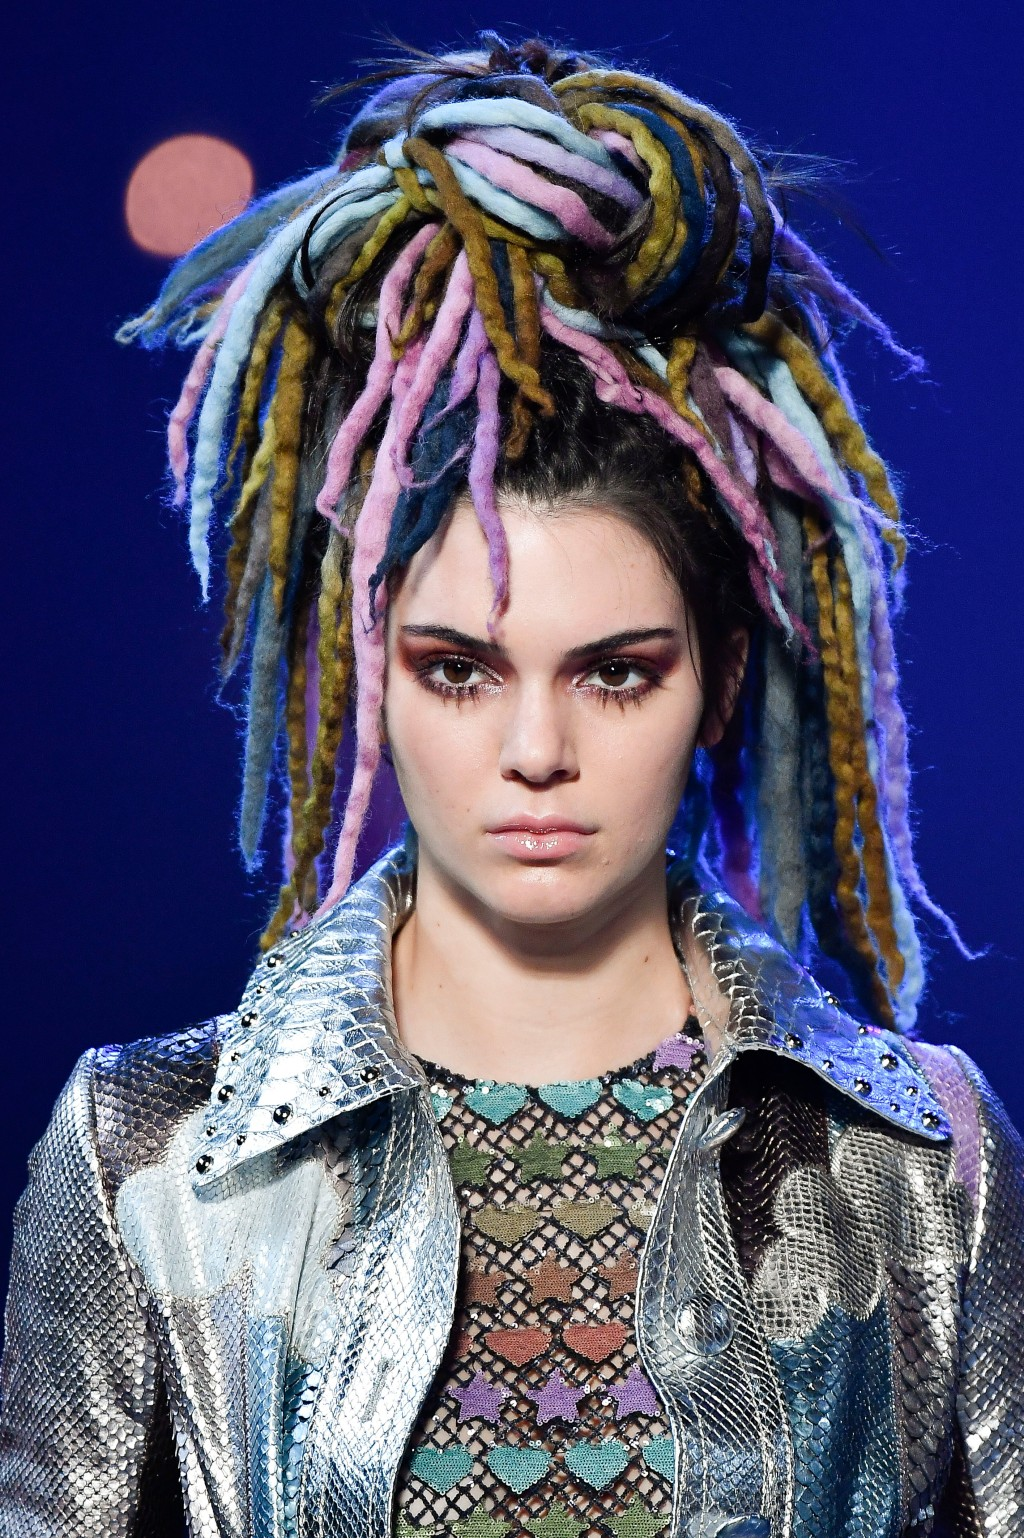 Marc Jacobs - Runway - September 2016 New York Fashion Week